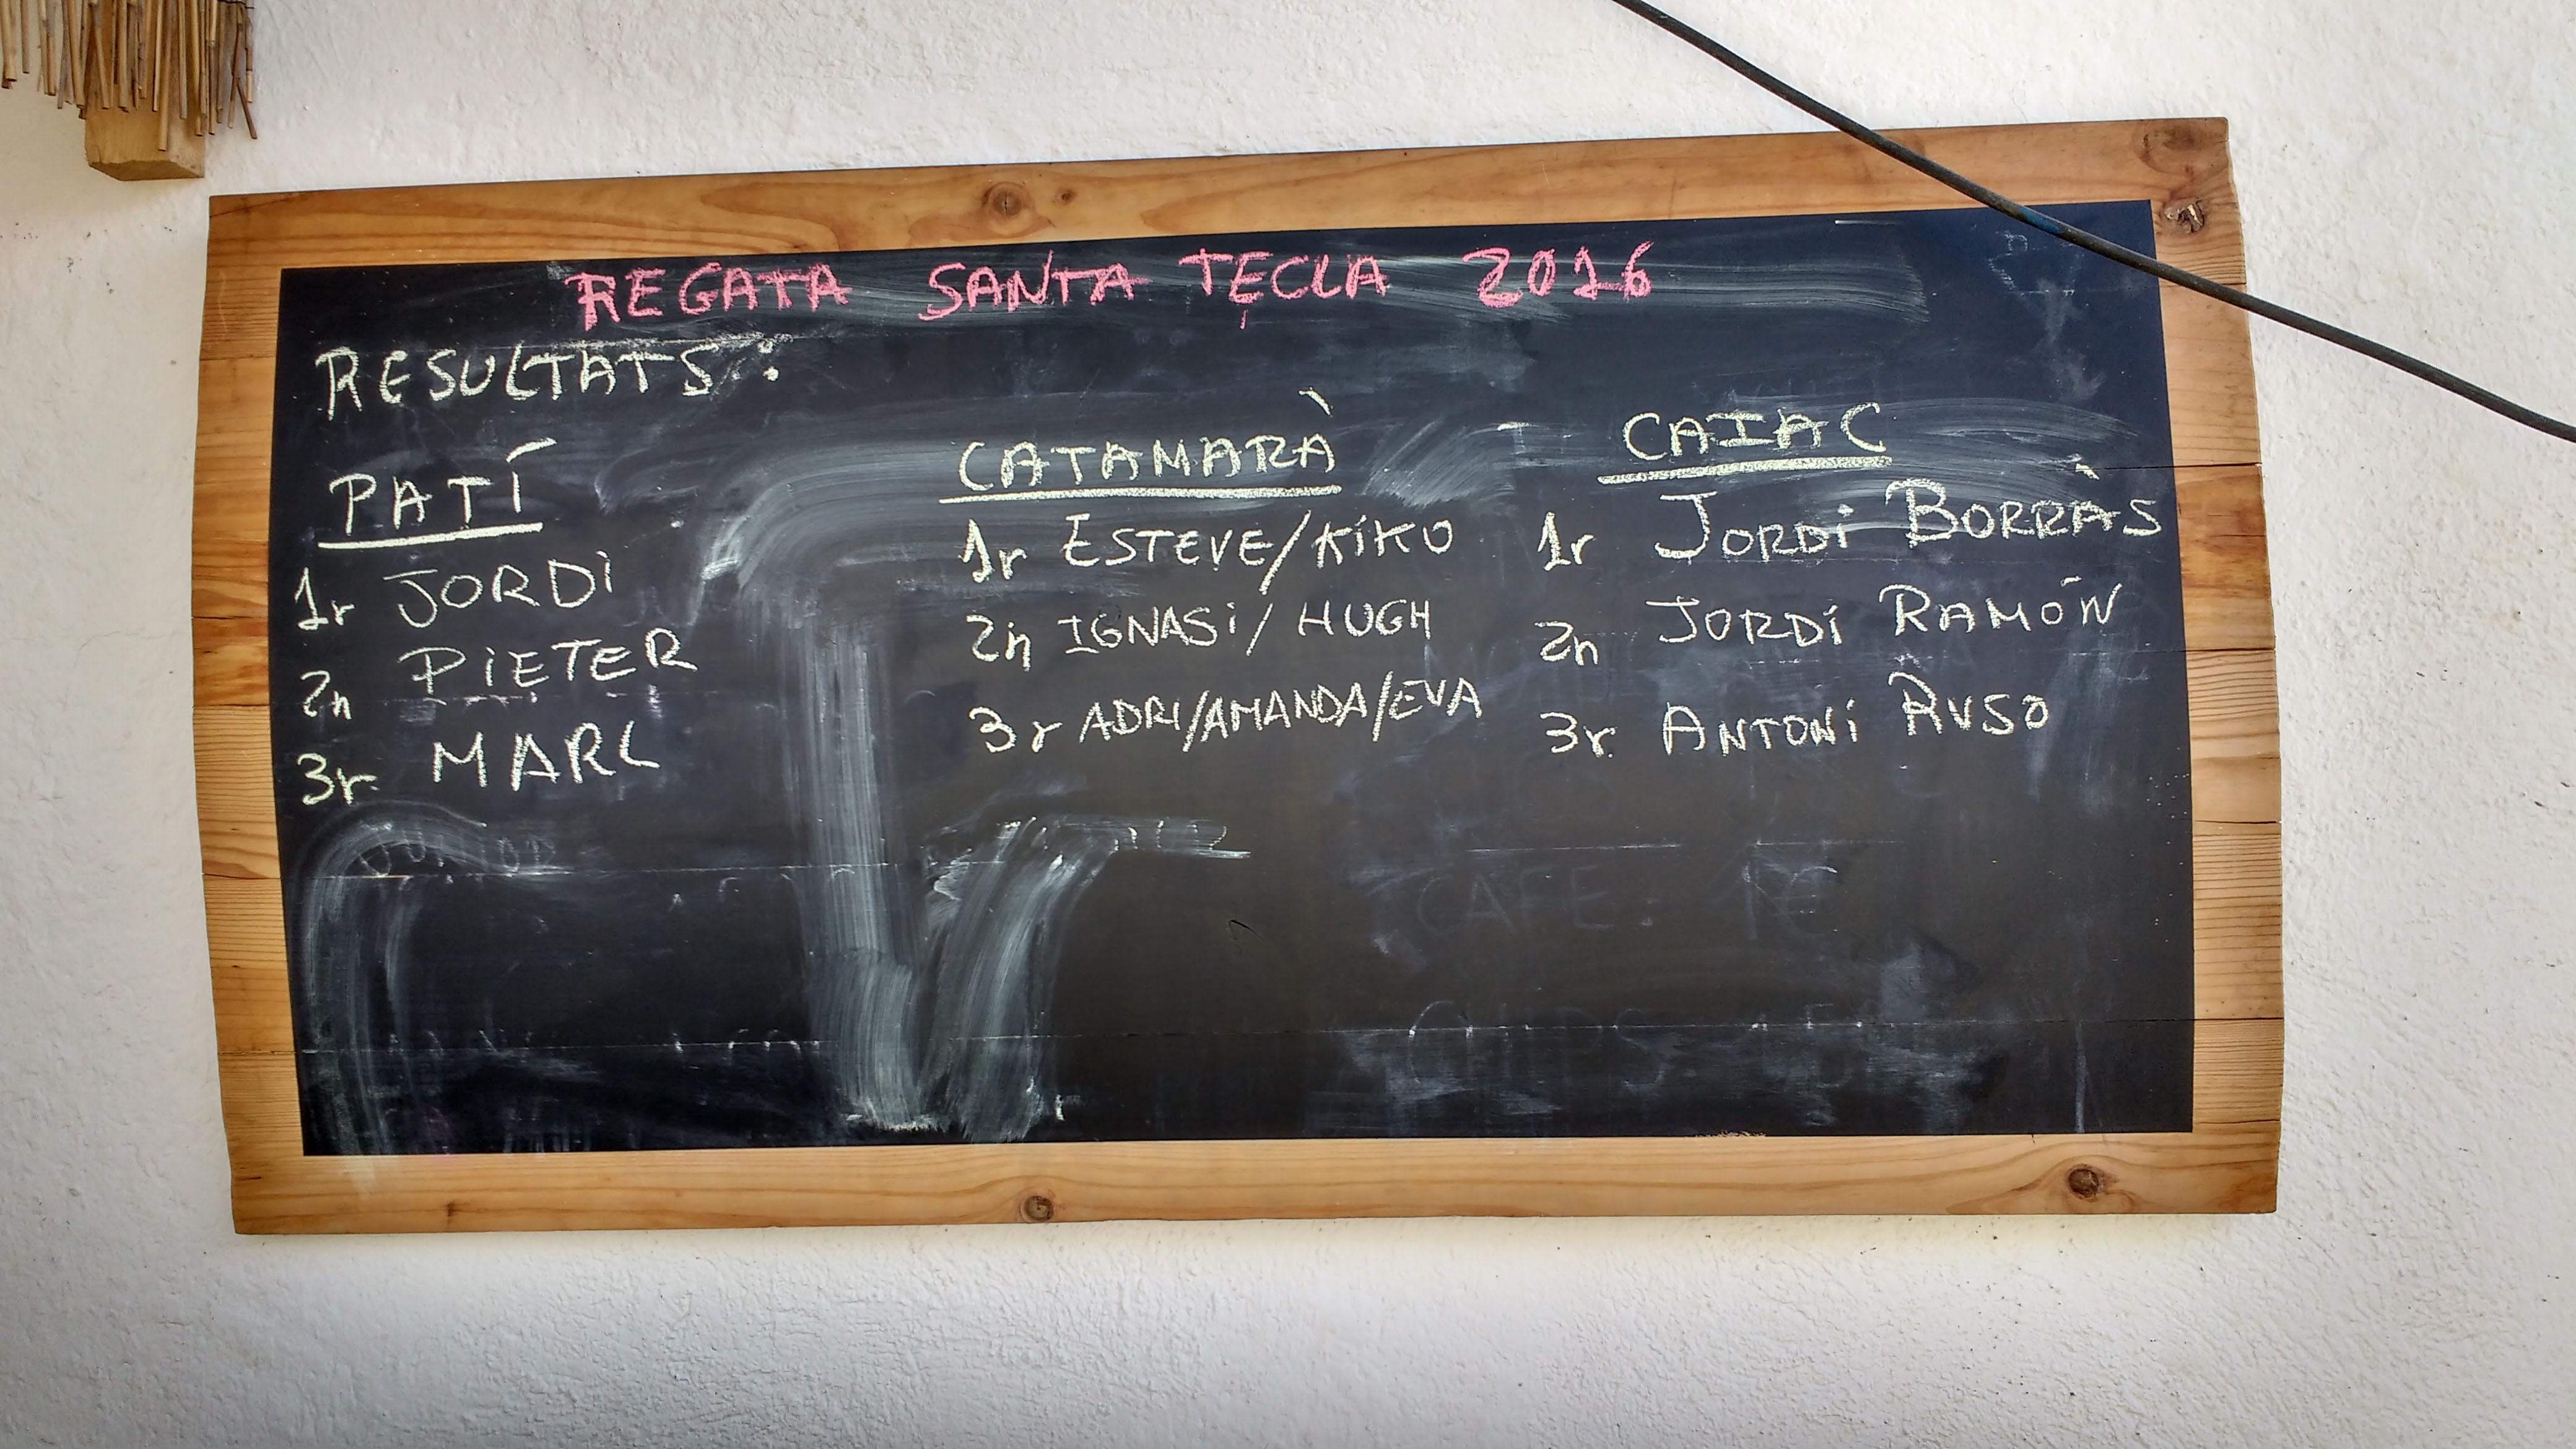 resultats regata santa tecla 2016